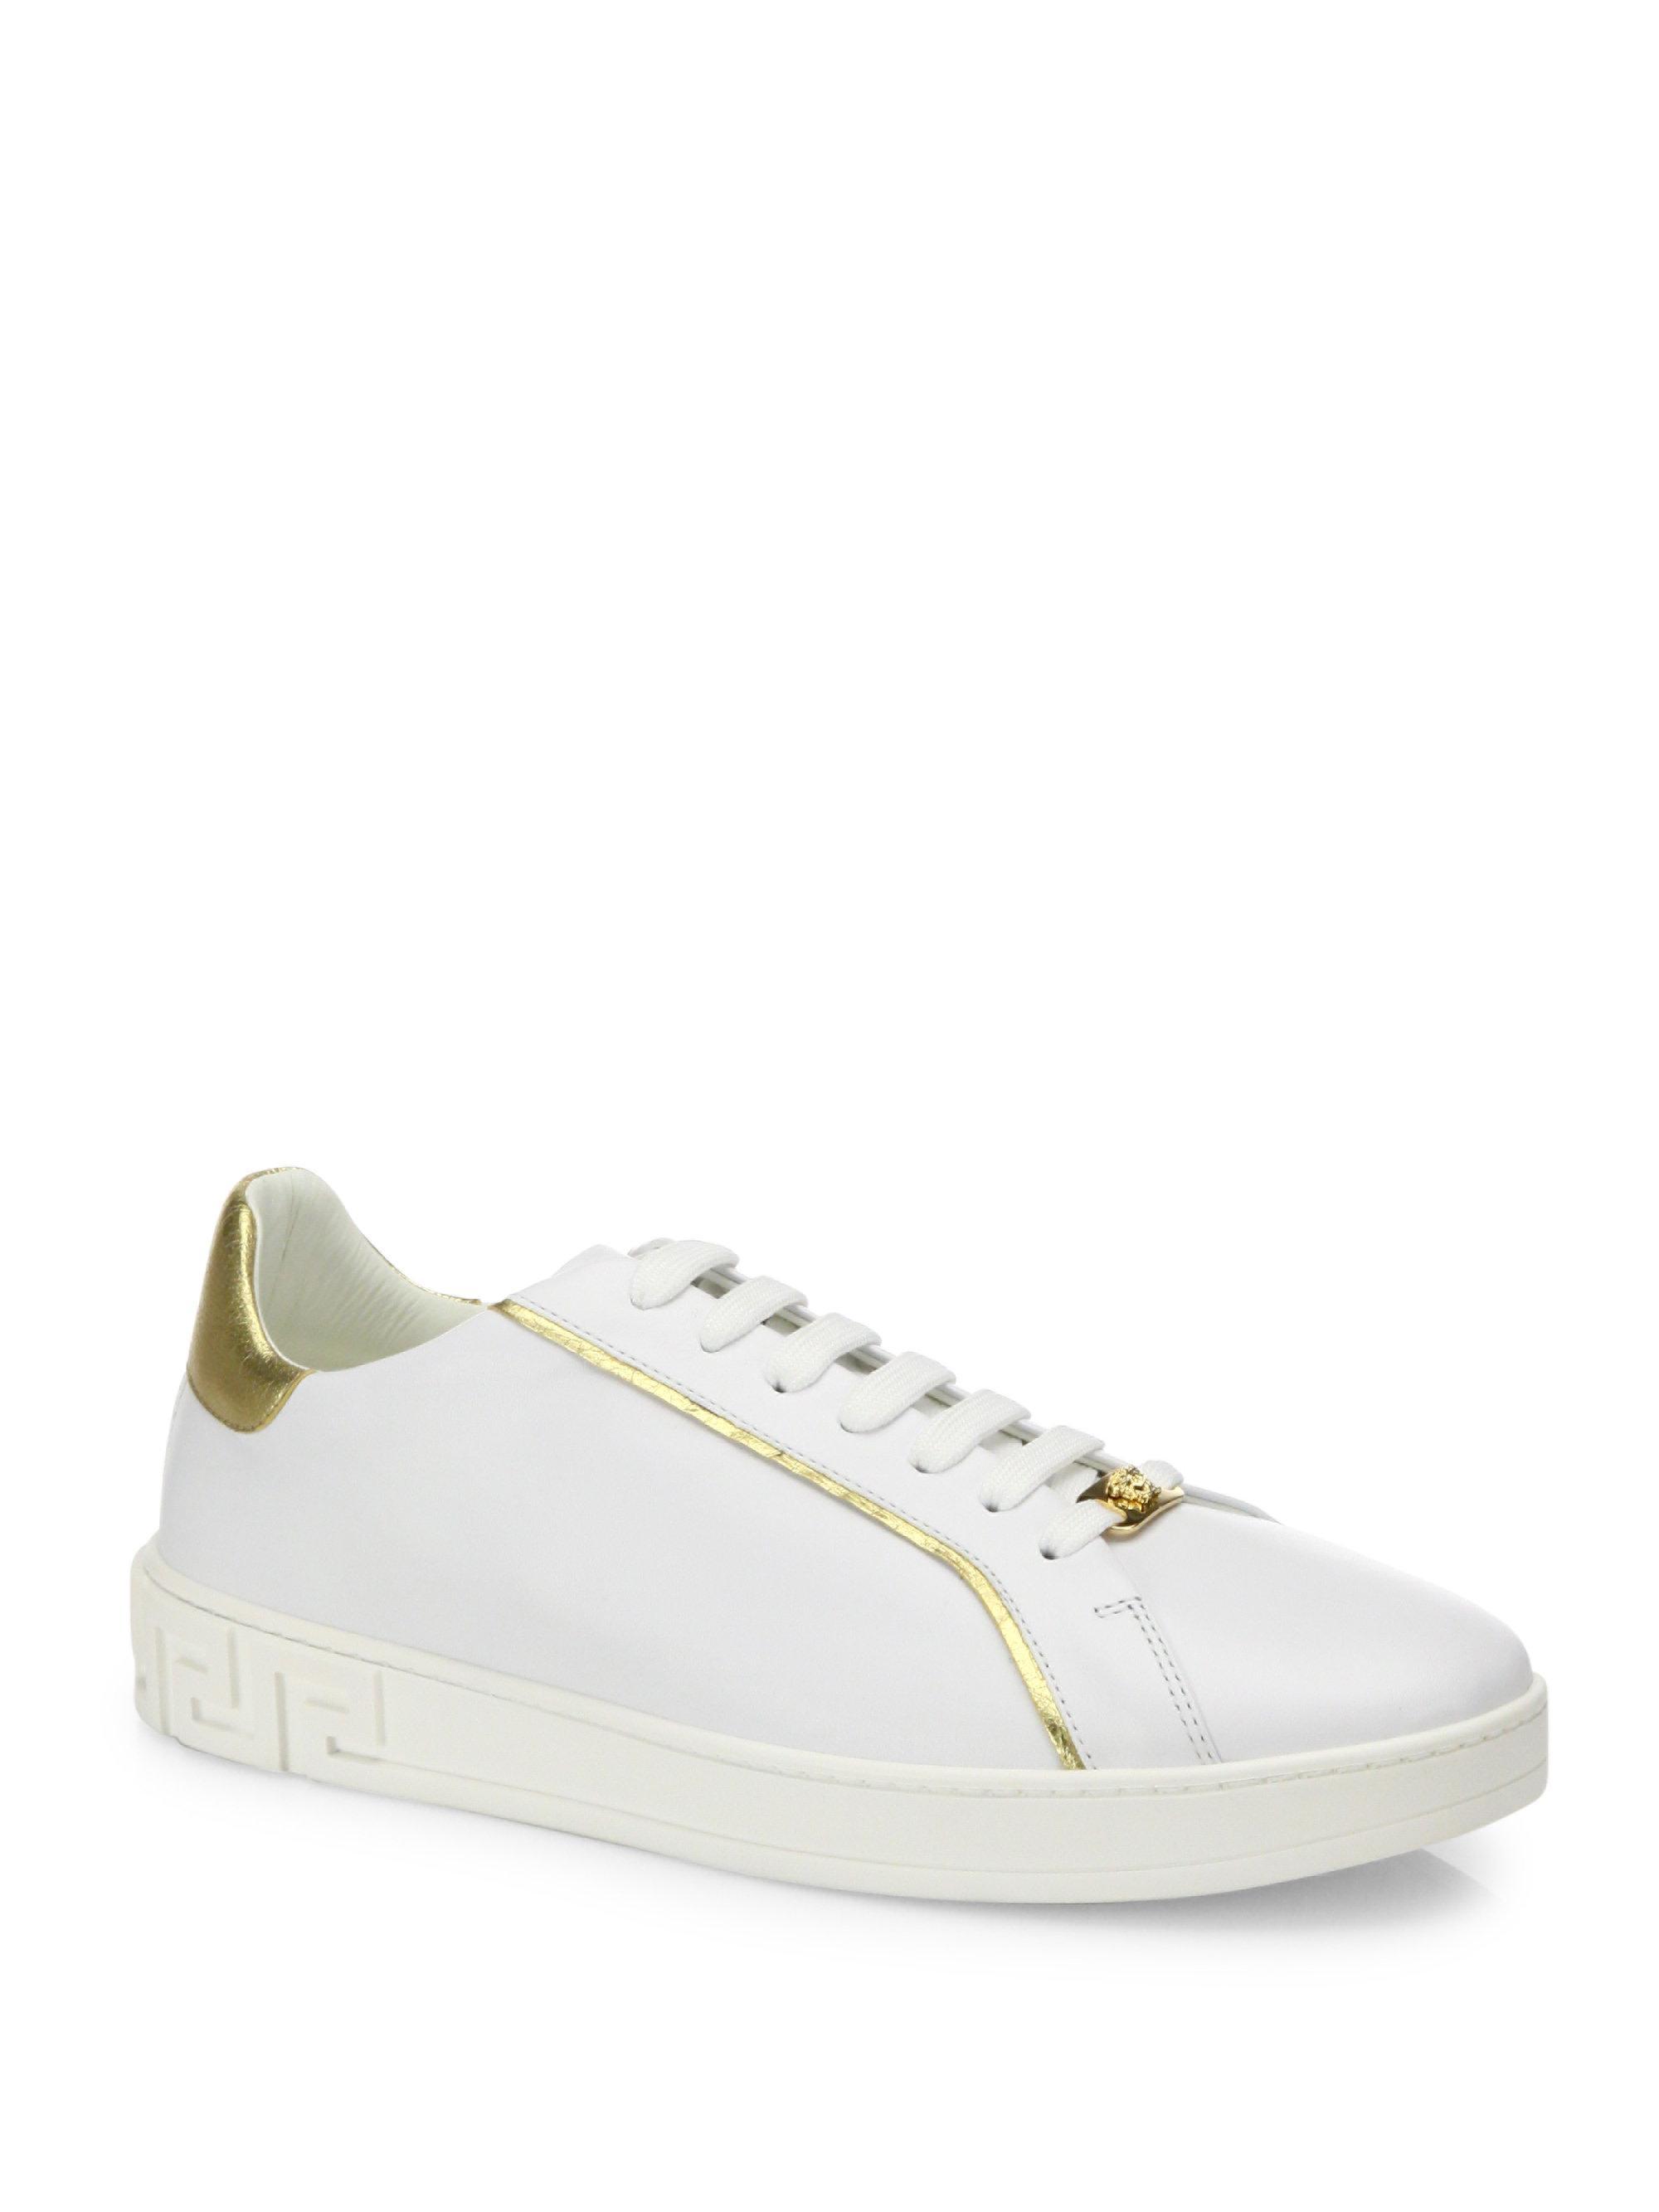 VERSACEGrecco Signature Accented Leather Low-Top Sneakers DeswFQf1Dj